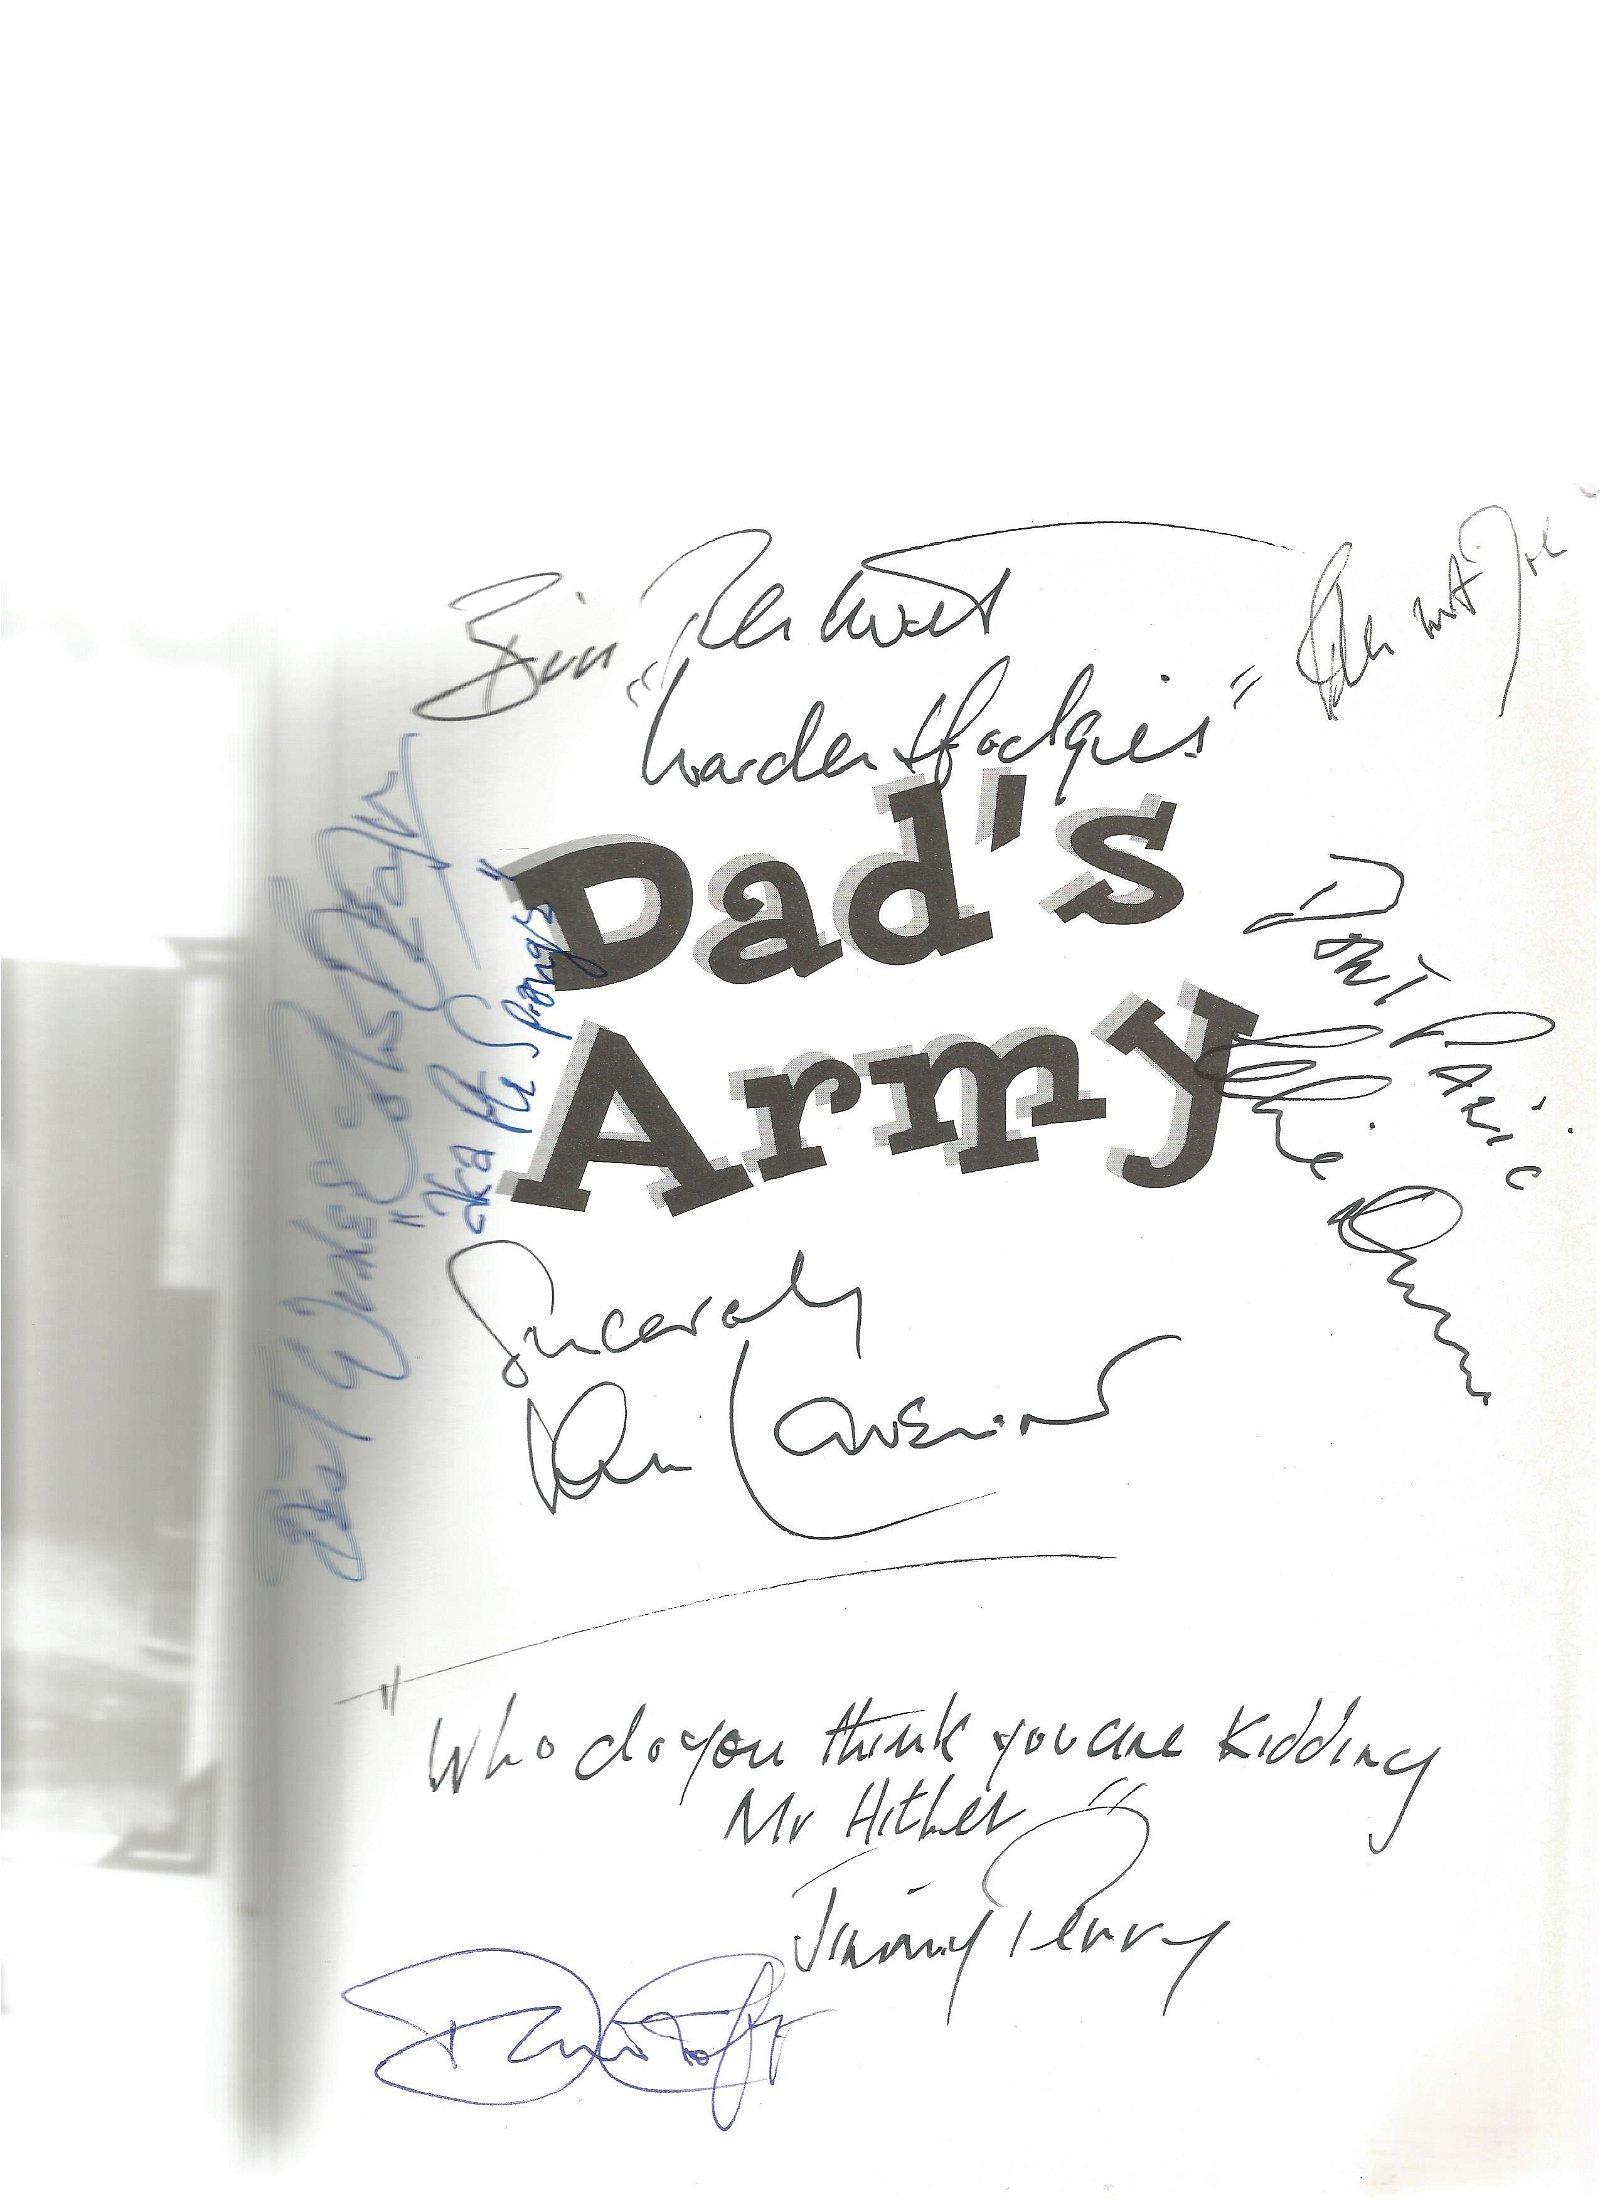 Dad's Army a celebration softback book signed inside by